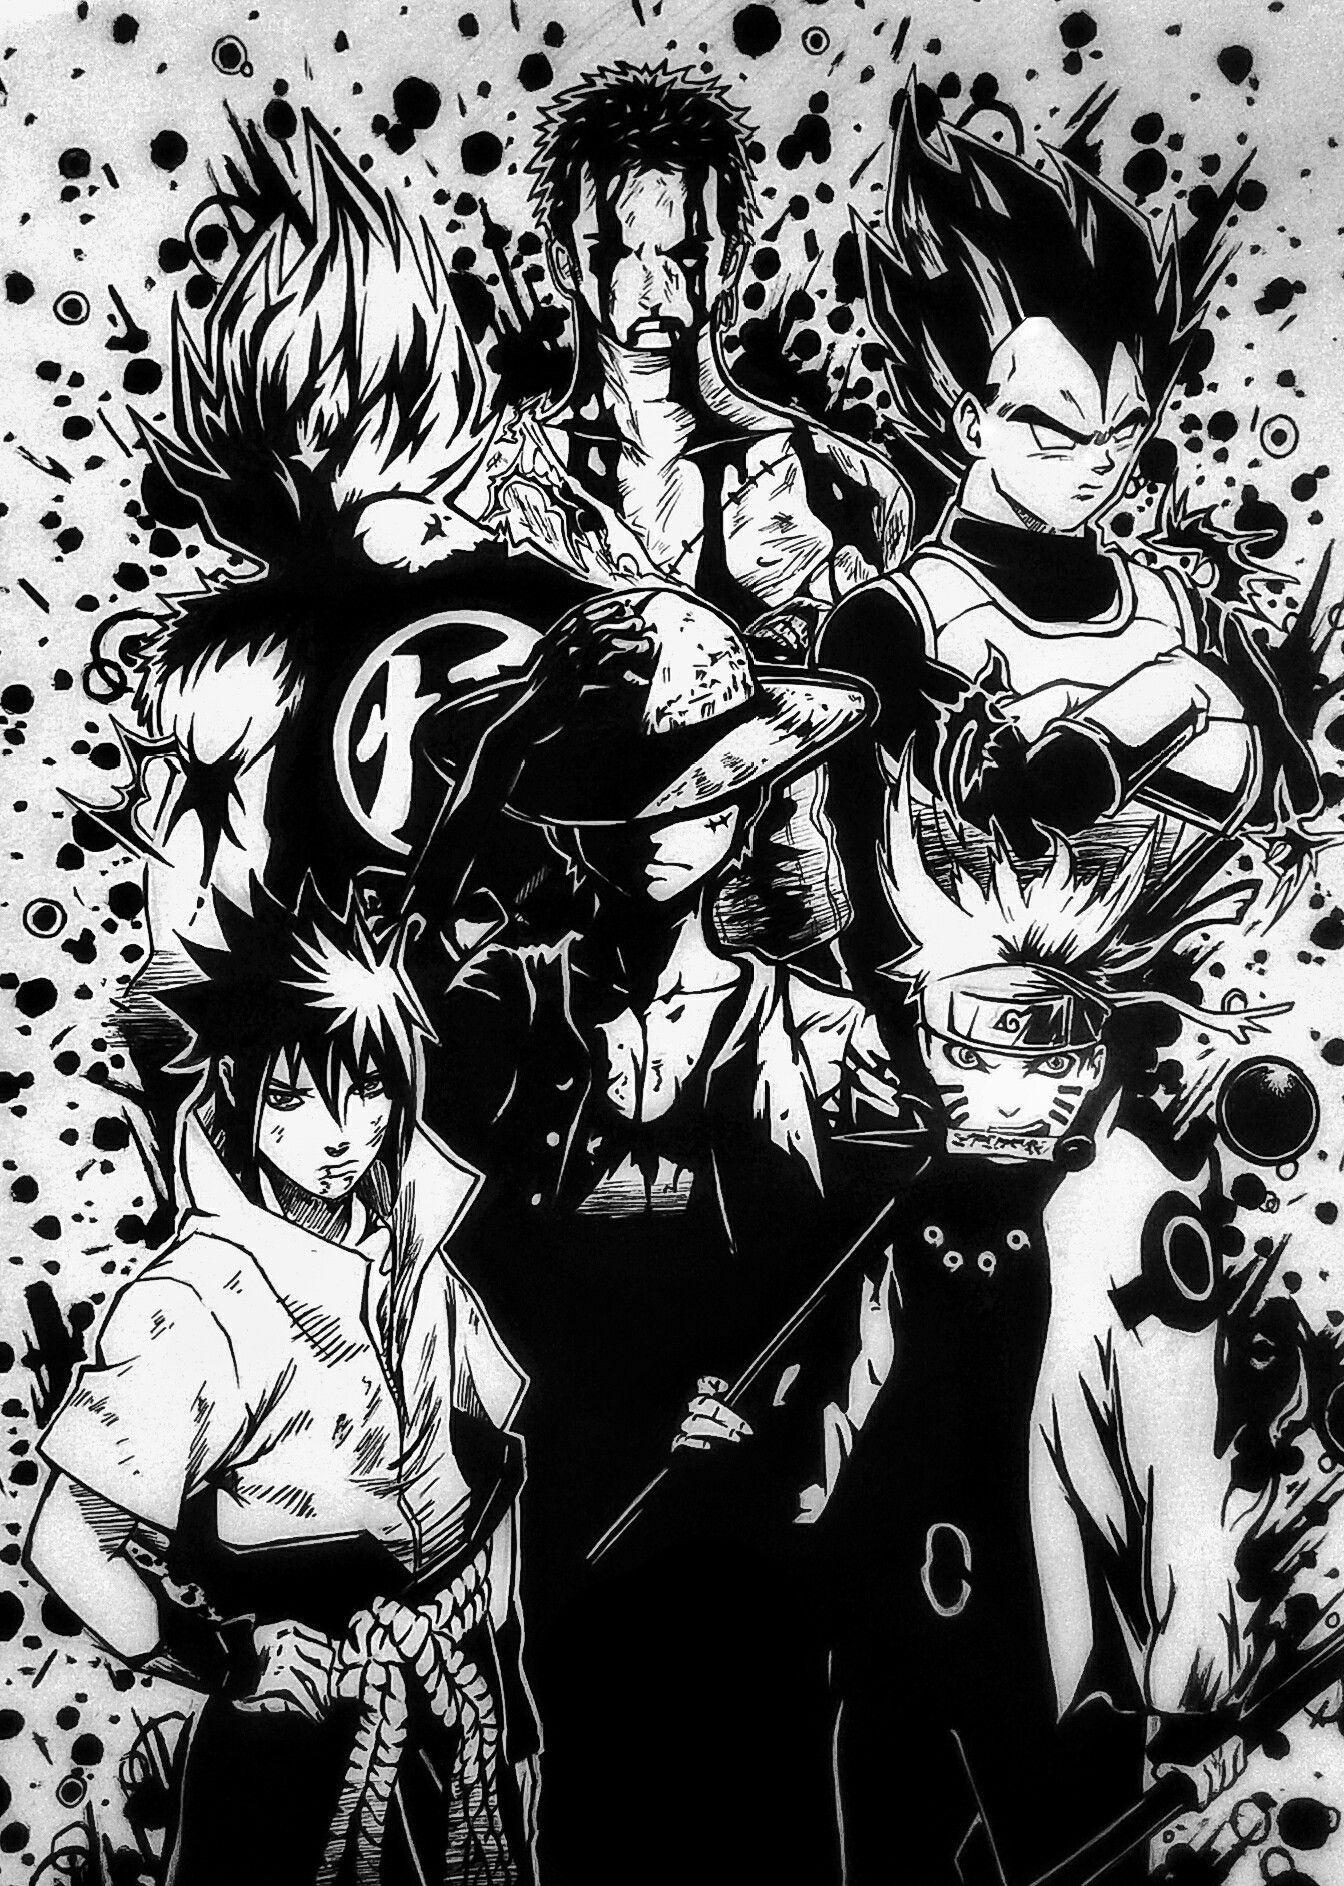 Zoro Goku Vegeta Luffy Naruto Sasuke Cool Anime Wallpapers Anime Crossover Anime Wallpaper